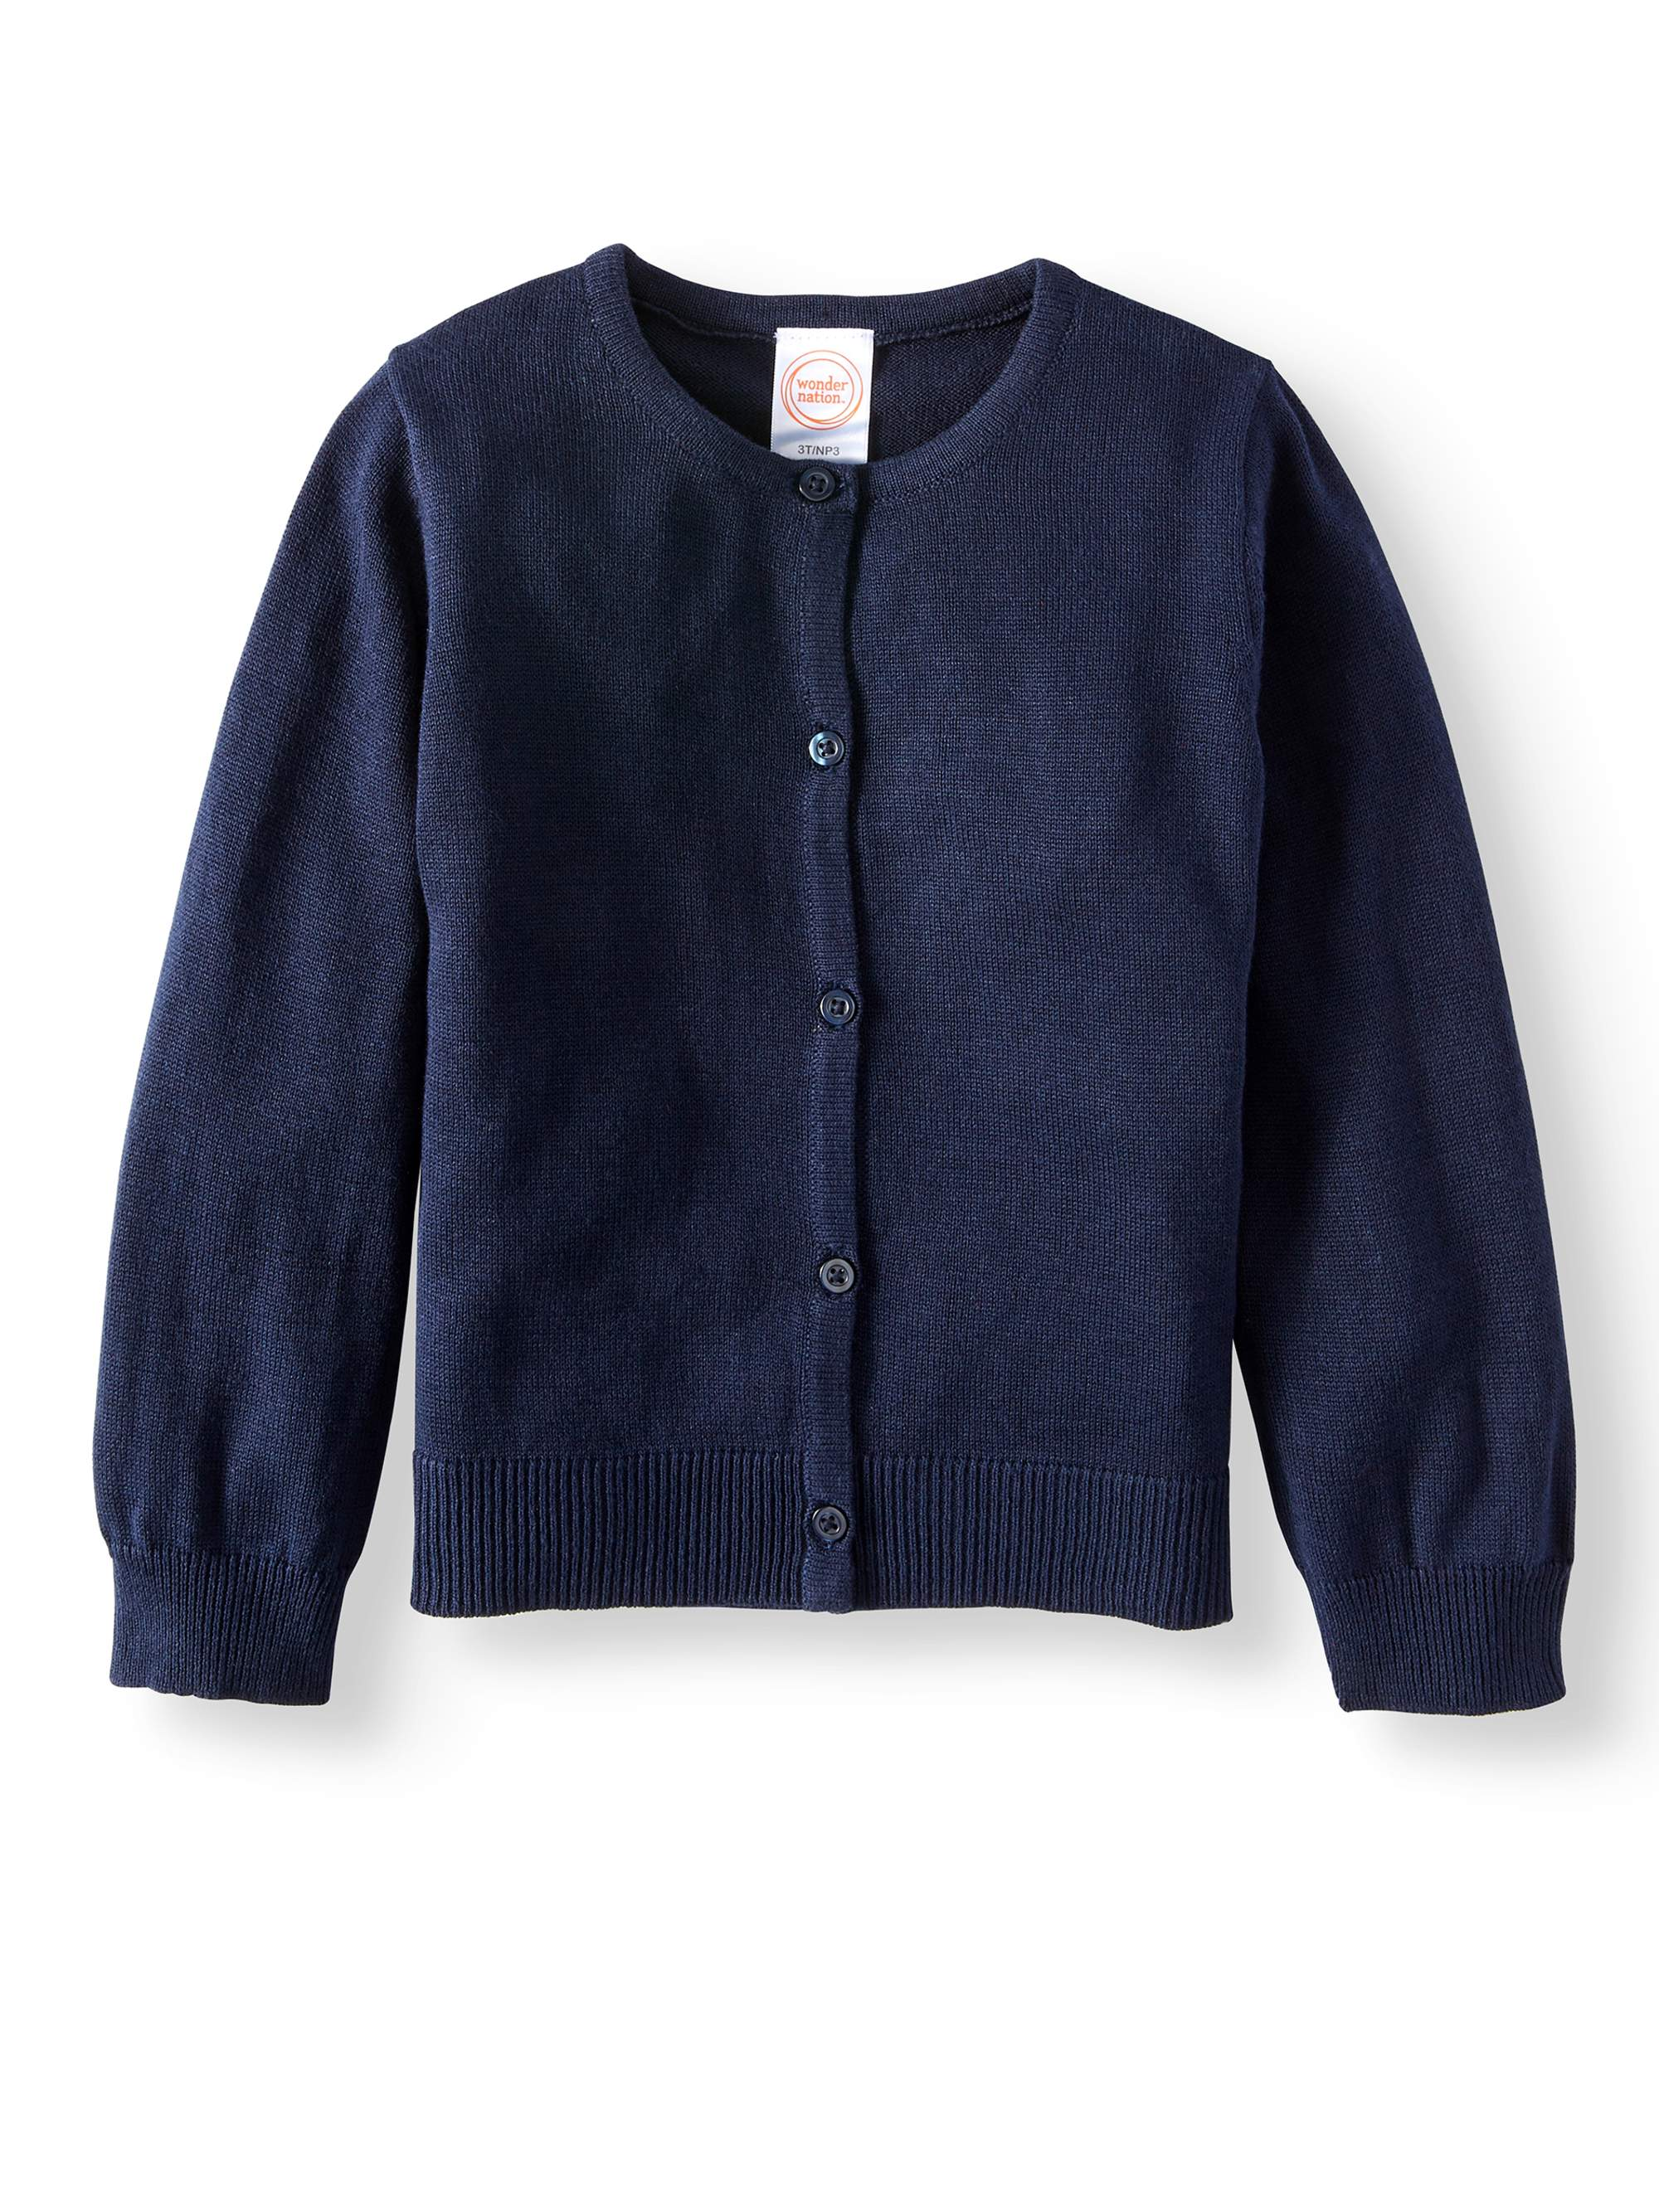 Toddler Girls School Uniform Knit Cardigan